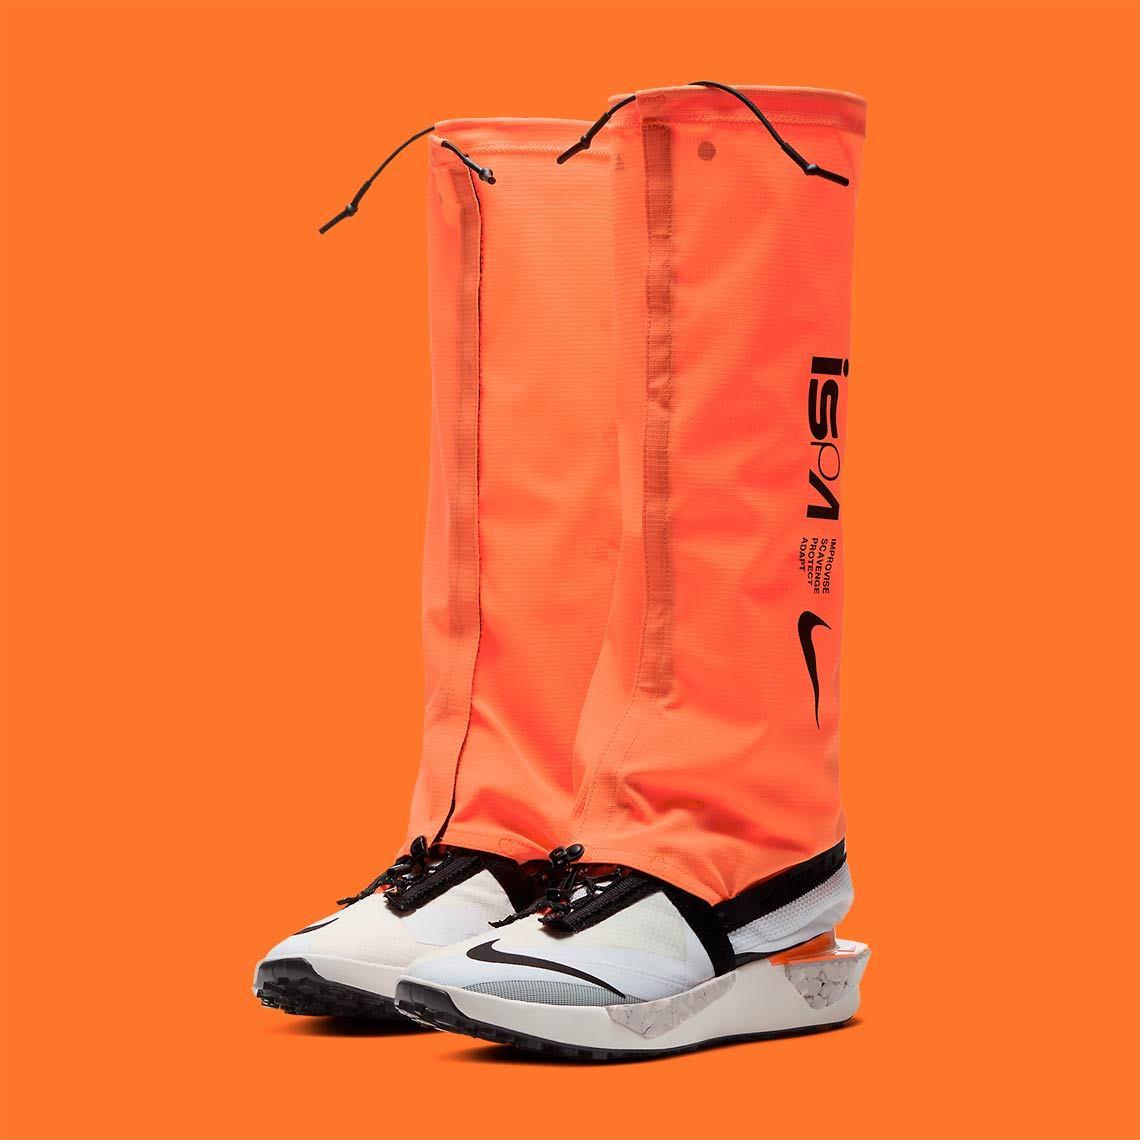 giày thể thao hot 9-15.10.2020- nike-ispa-driftor-elle man-ci1392-100 (8)